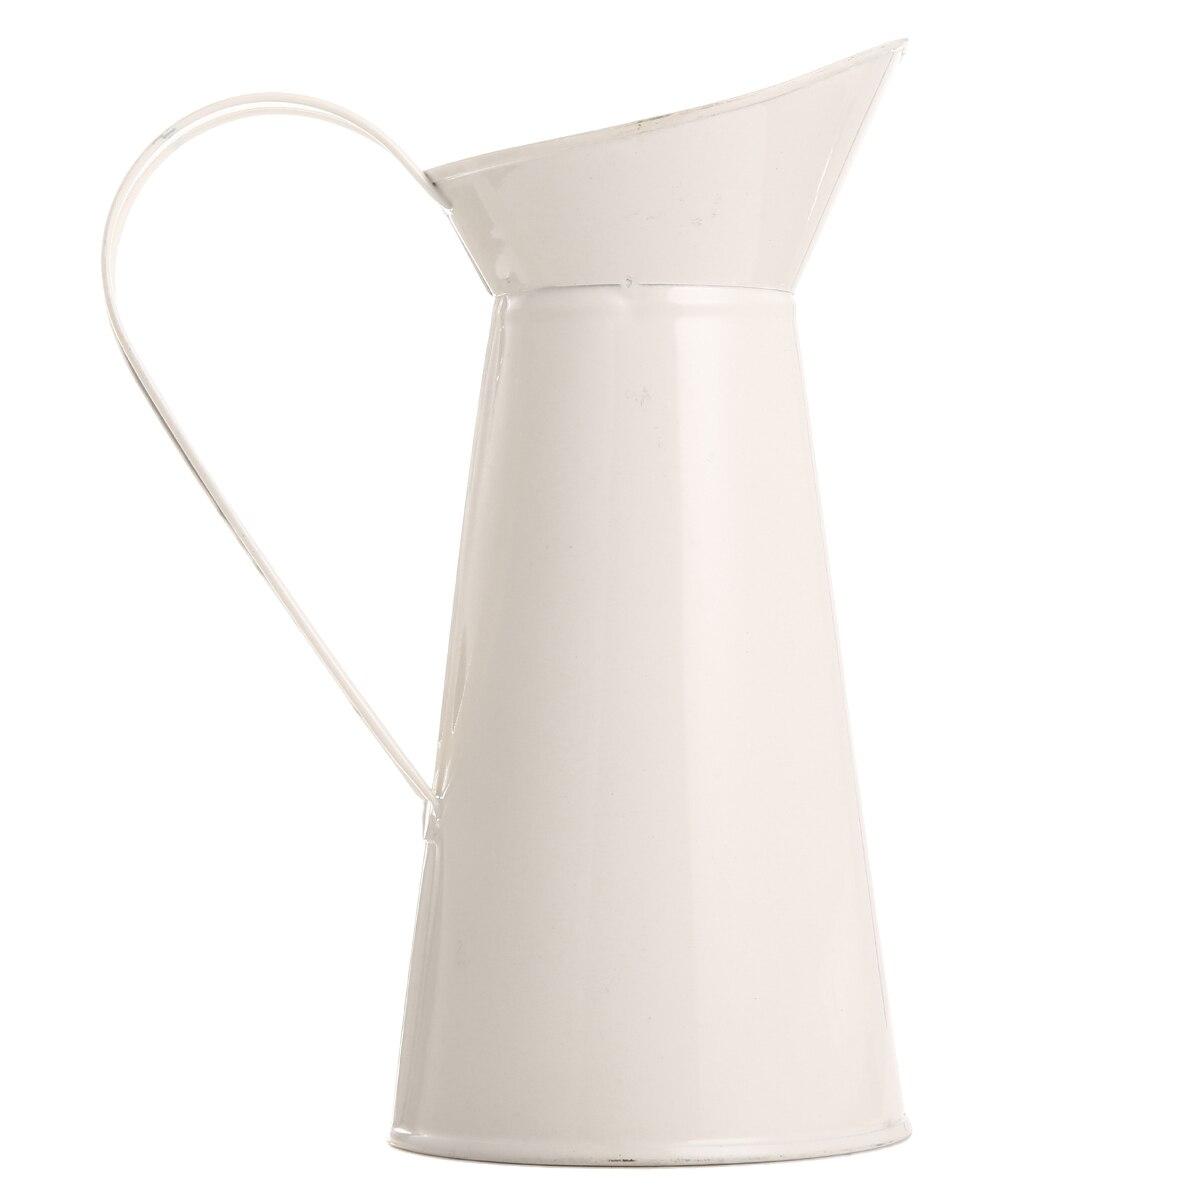 1pc Shabby Chic Cream Flower Vase Enamel Pitcher Jug Retro Iron Tub For Wedding Home Decor Storage Bucket Tool